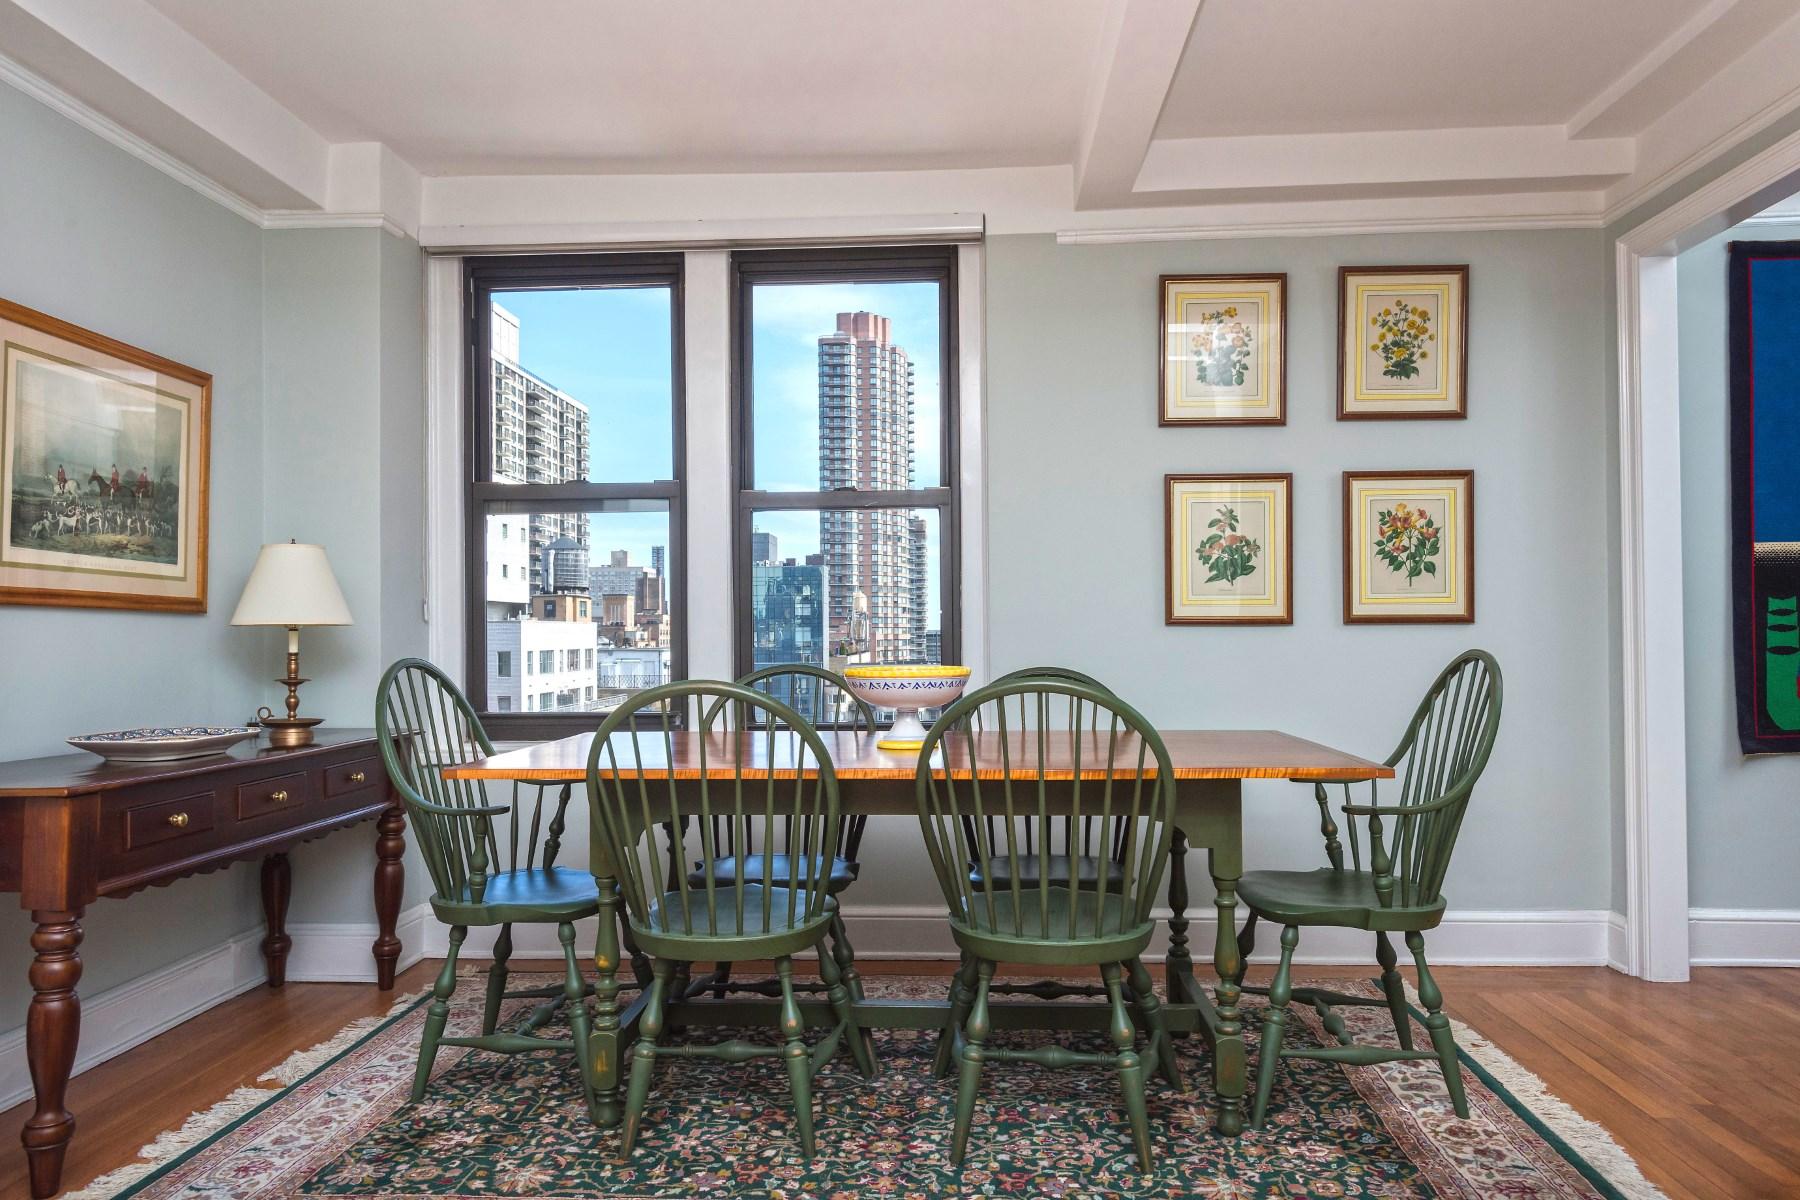 Кооперативная квартира для того Продажа на 205 East 78th Street, Apt. 19T 205 East 78th Street Apt 19T New York, Нью-Йорк, 10075 Соединенные Штаты